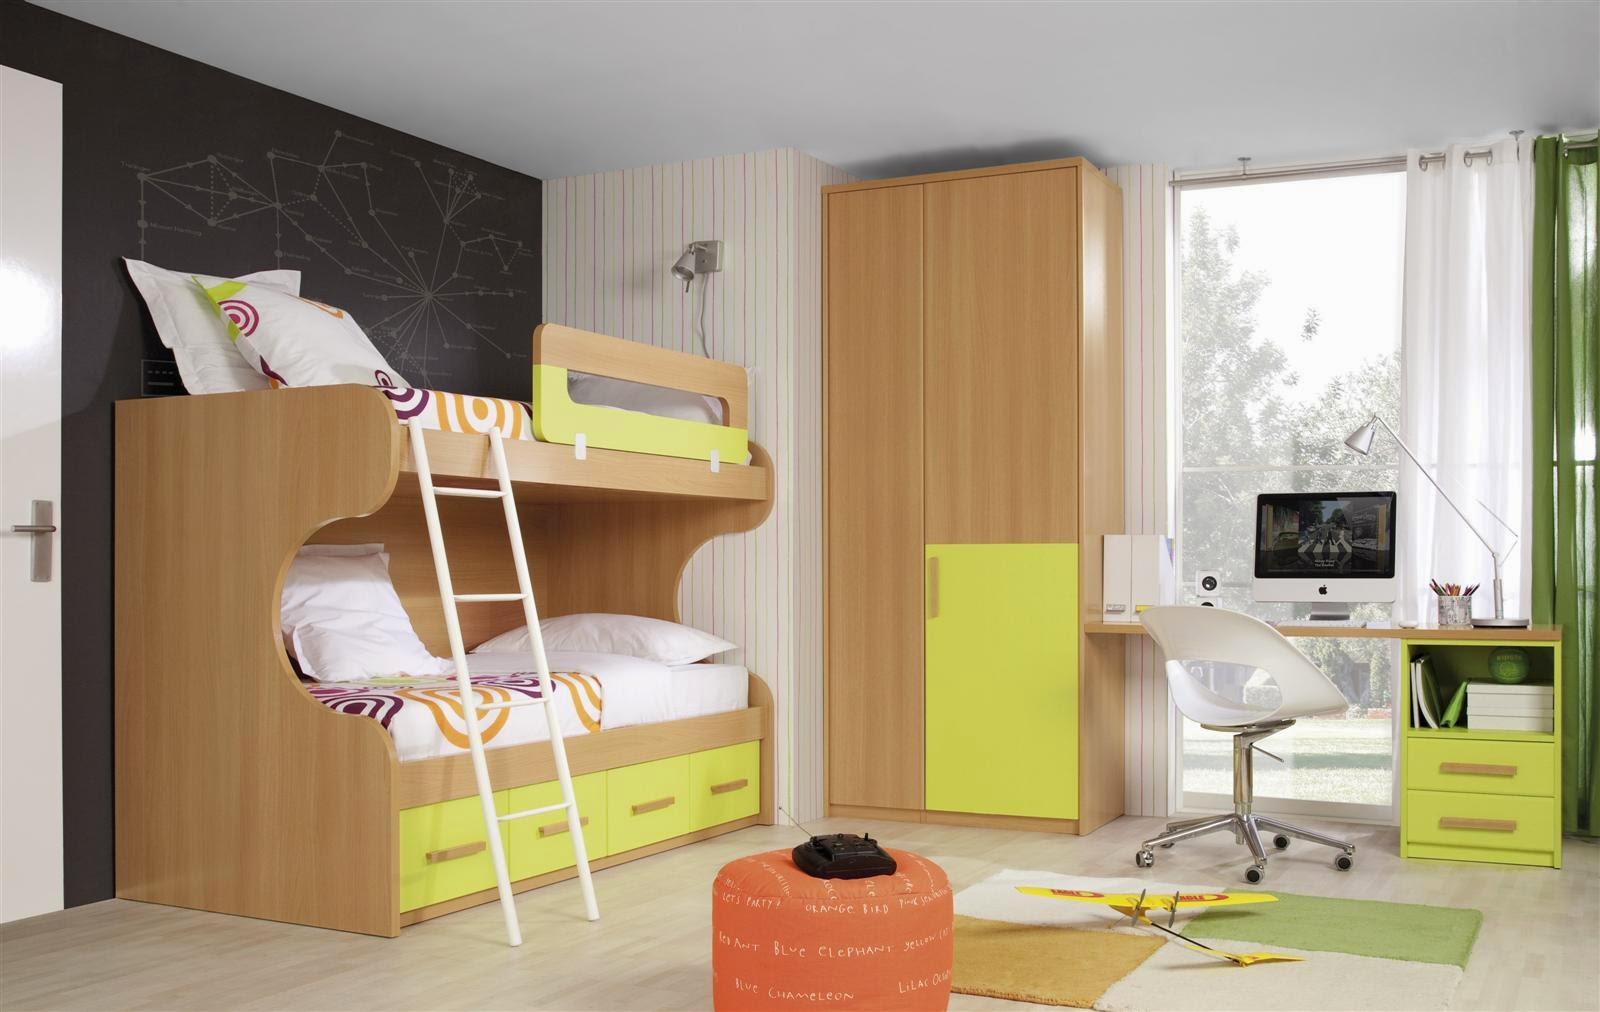 Tkautiva dormitorios juveniles i elegir una cama for Medidas camas compactas juveniles